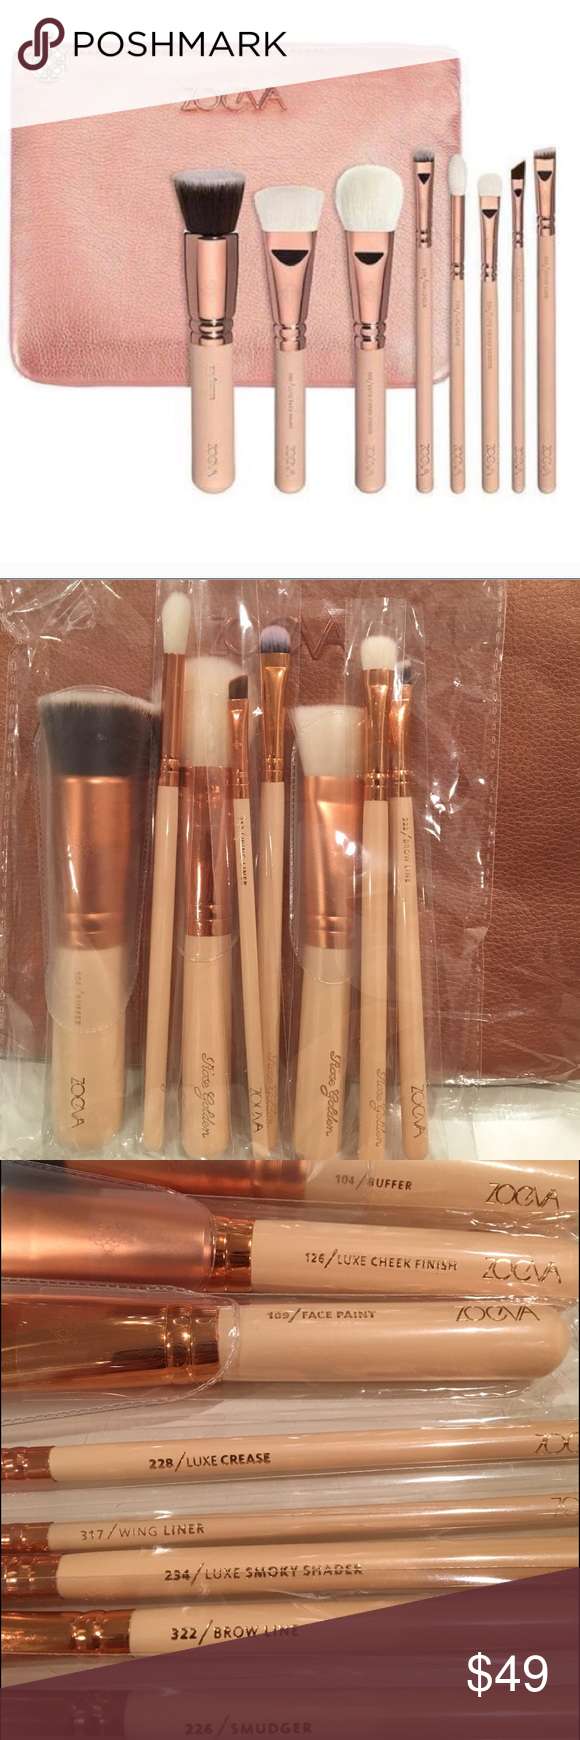 Zoeva 8pc makeup brush set Zoeva rose gold brush set 8pc